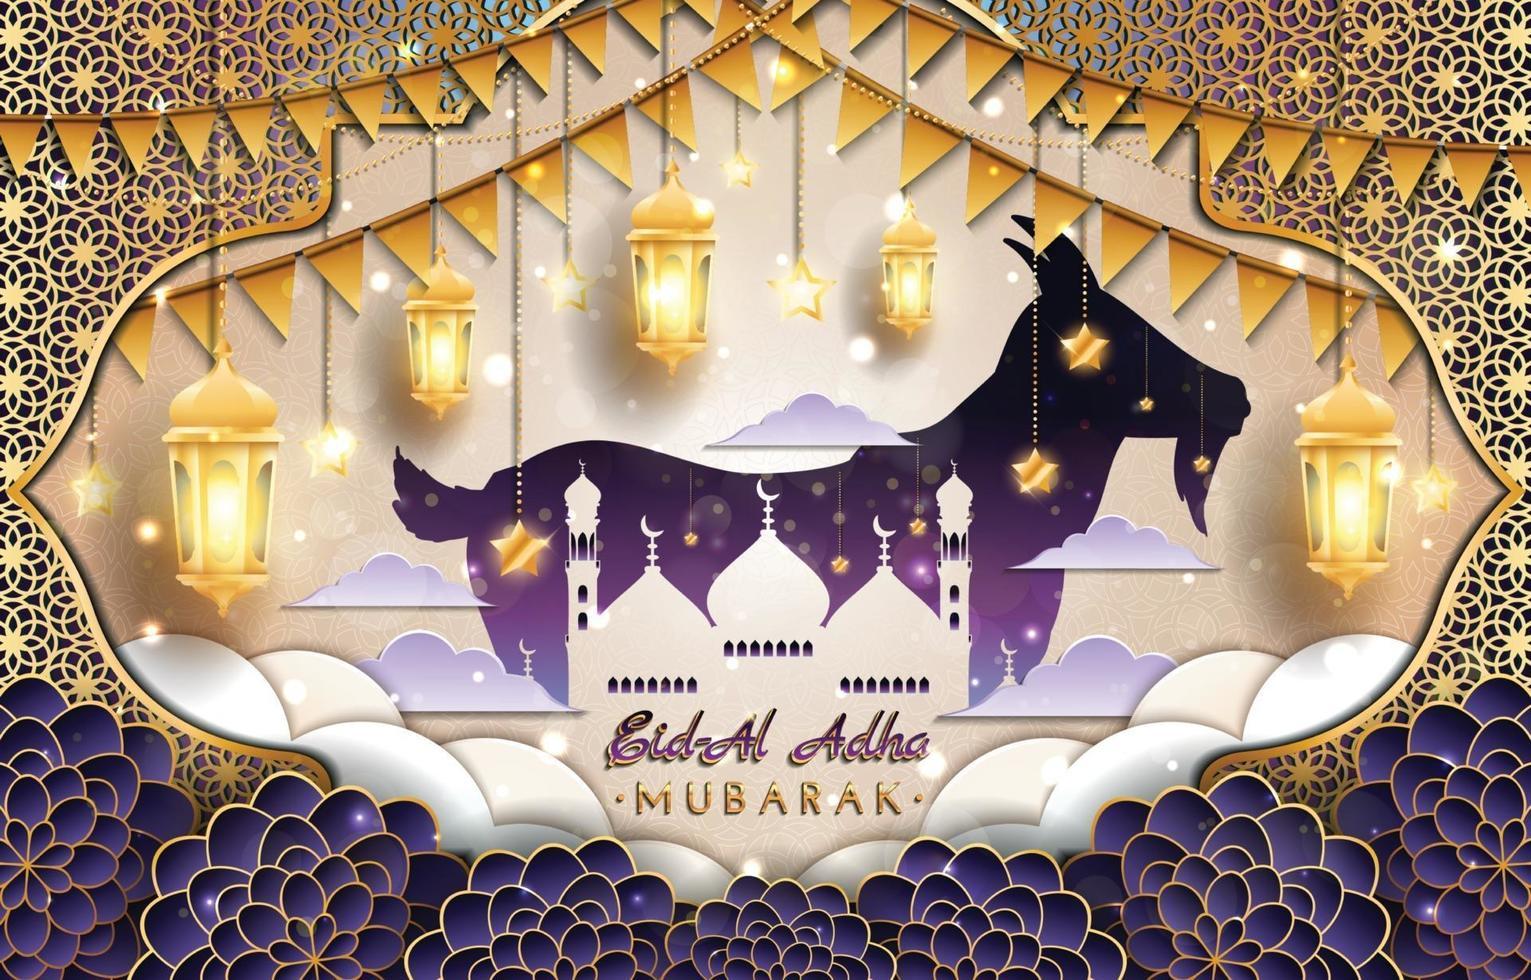 Eid Al Adha Mubarak with Goat and Mosque Concept vector